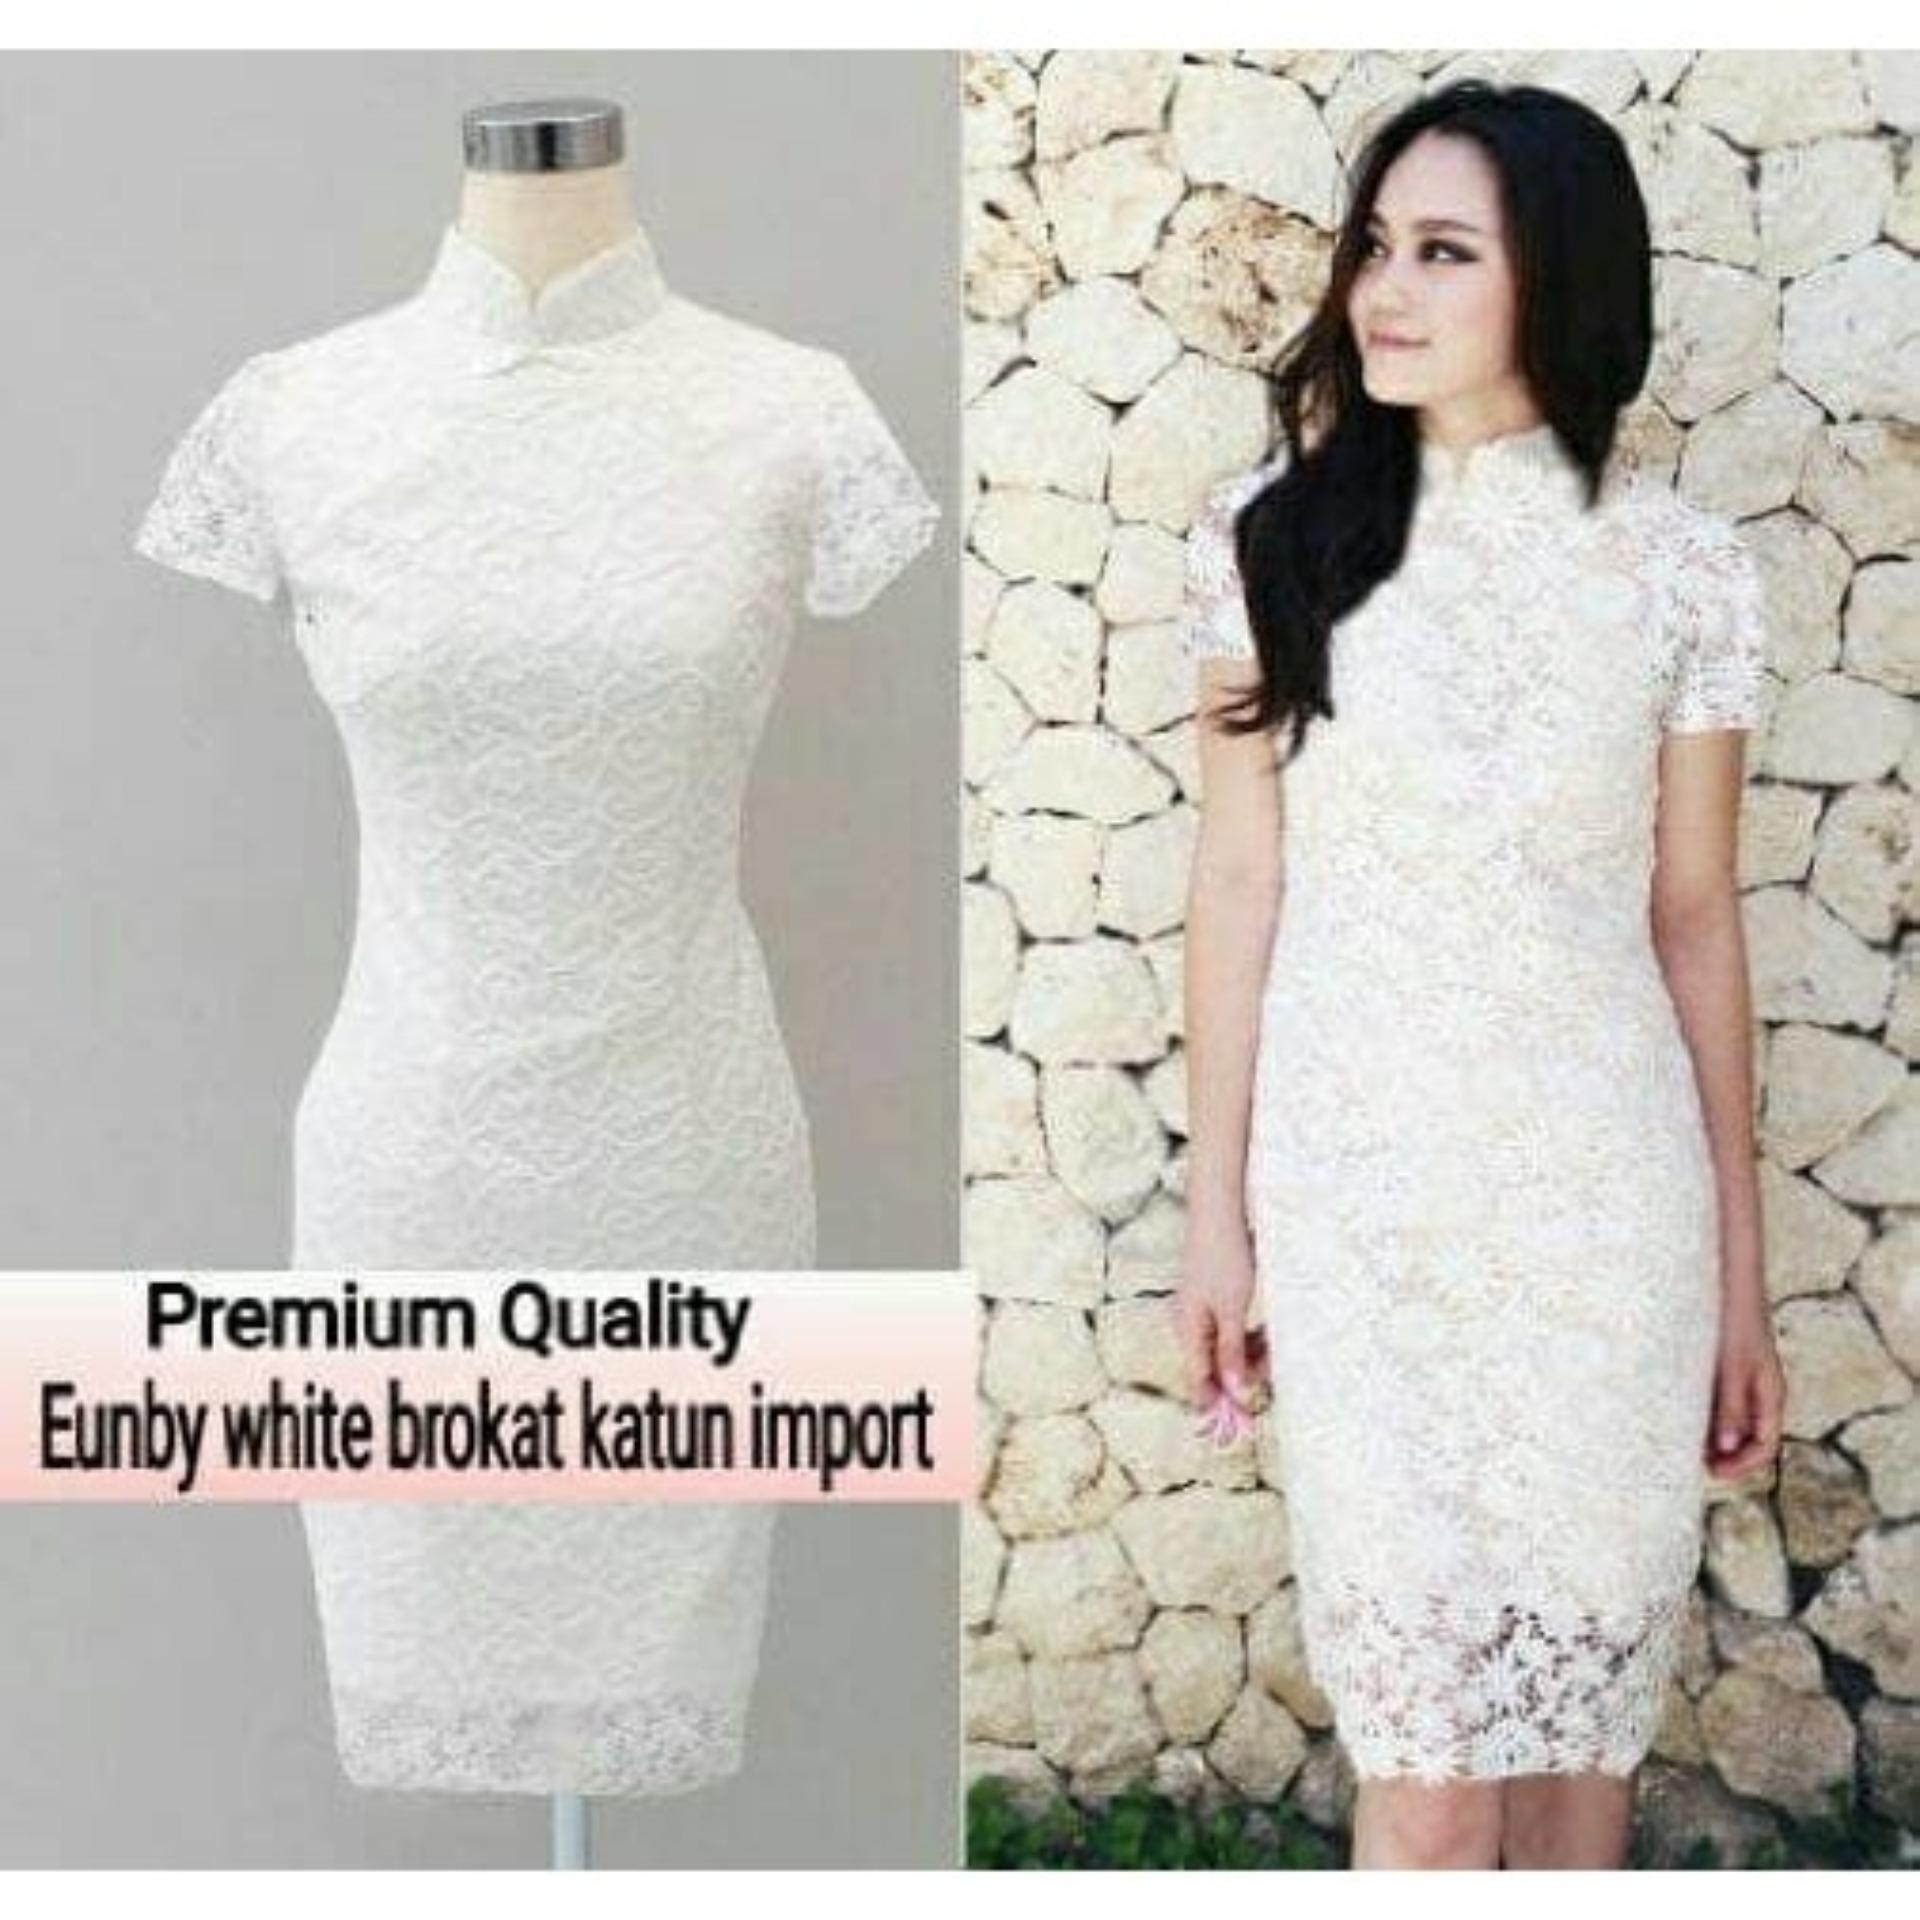 C&Buy Store Gaun Midi Brukat Wanita UNBIE / Midi Dress Wanita / Dress Brukat Cewek Gaun